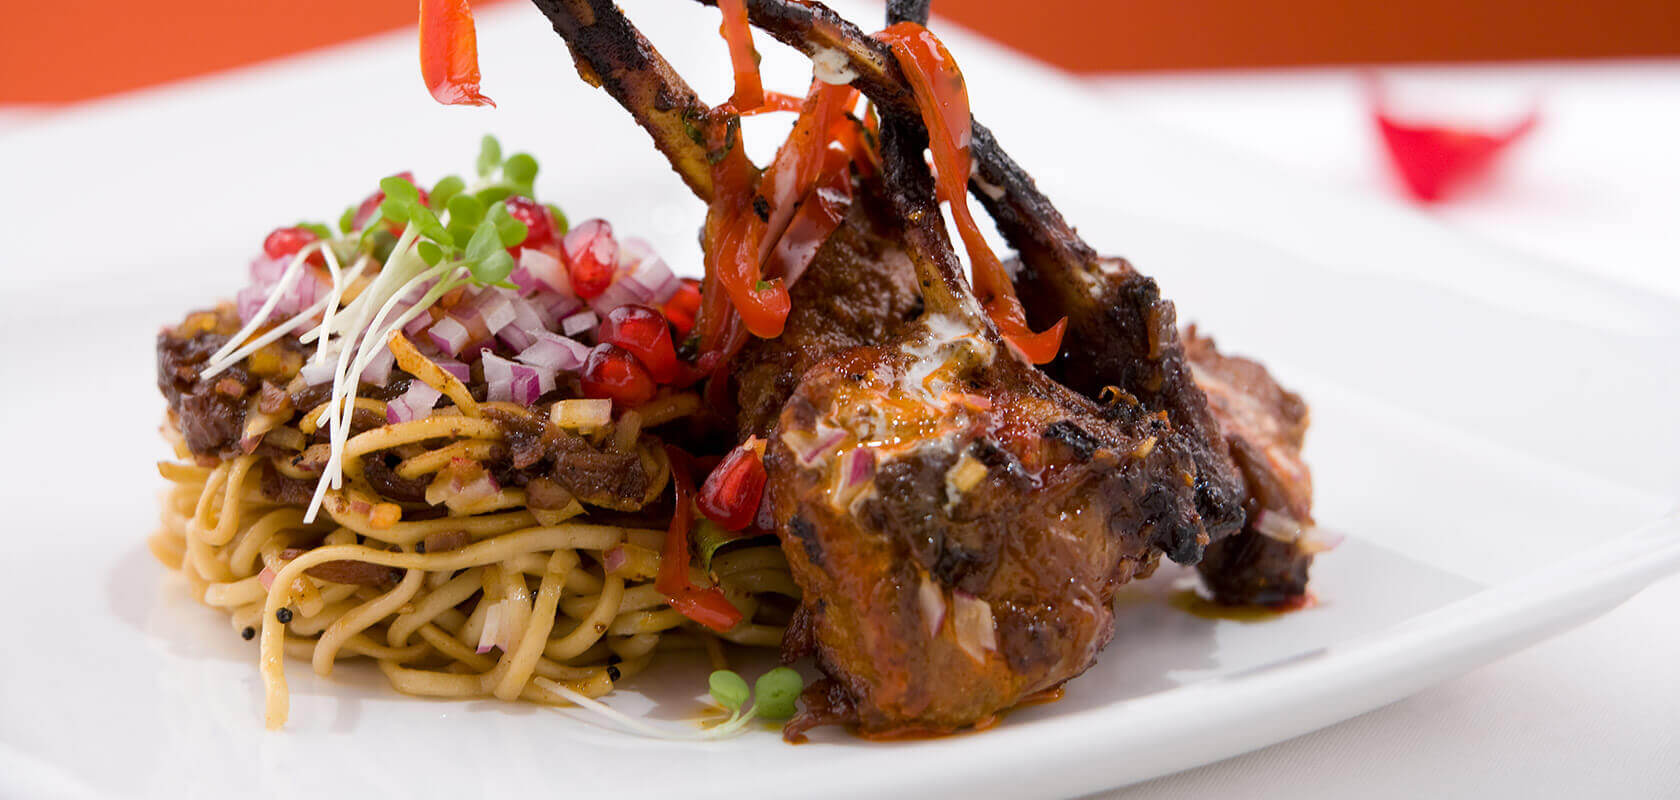 Indian Food created by Zari - Indian Restaurant Crawley